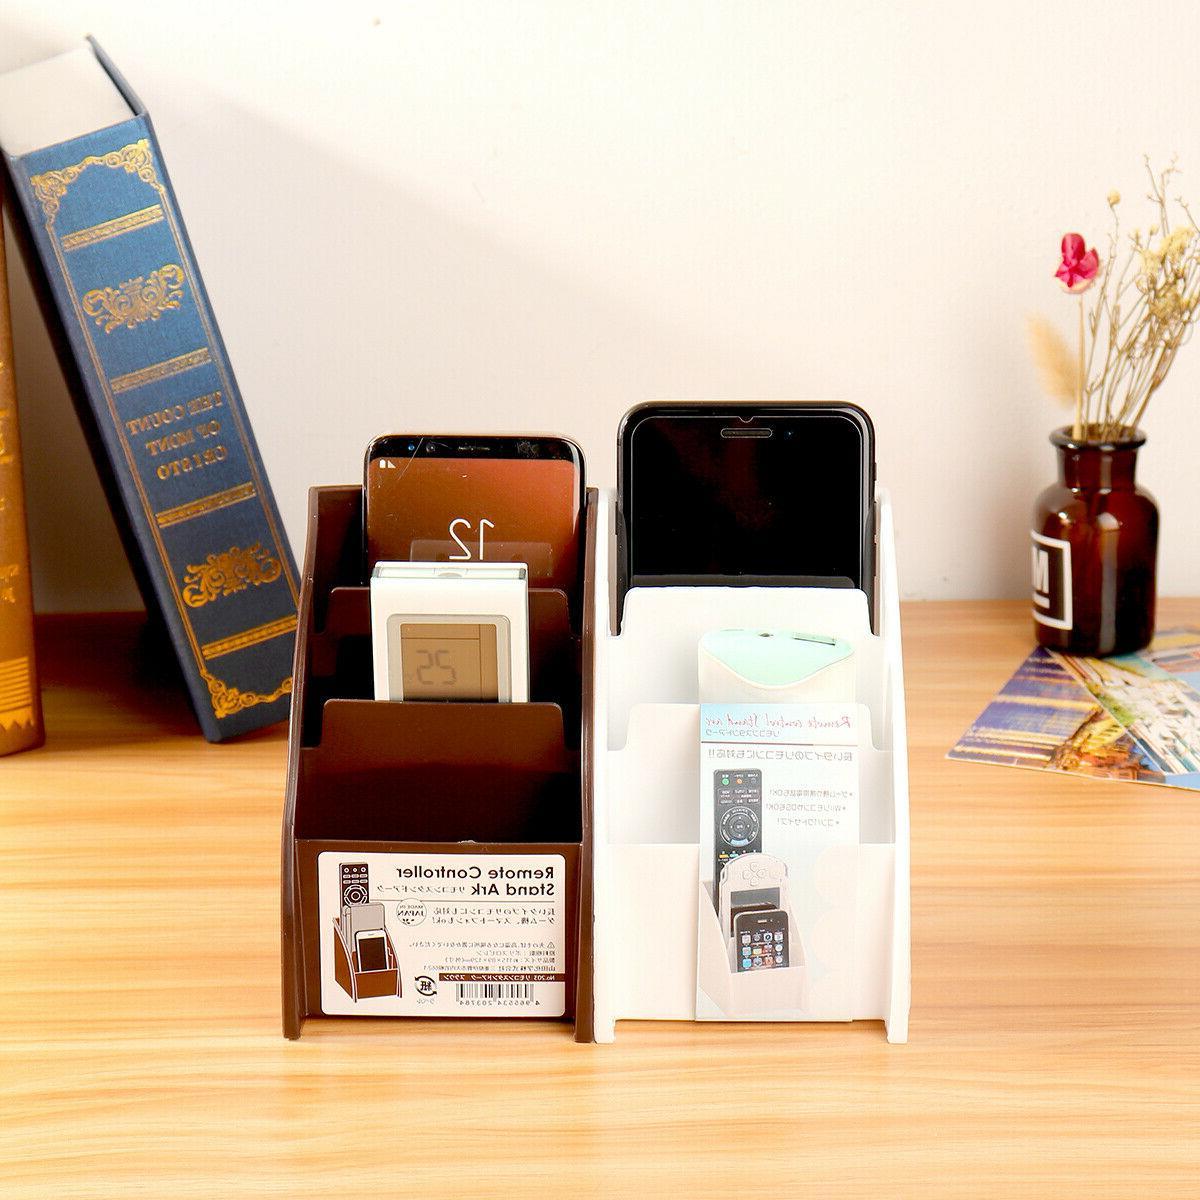 Phone/TV Remote Box Home Holder White /